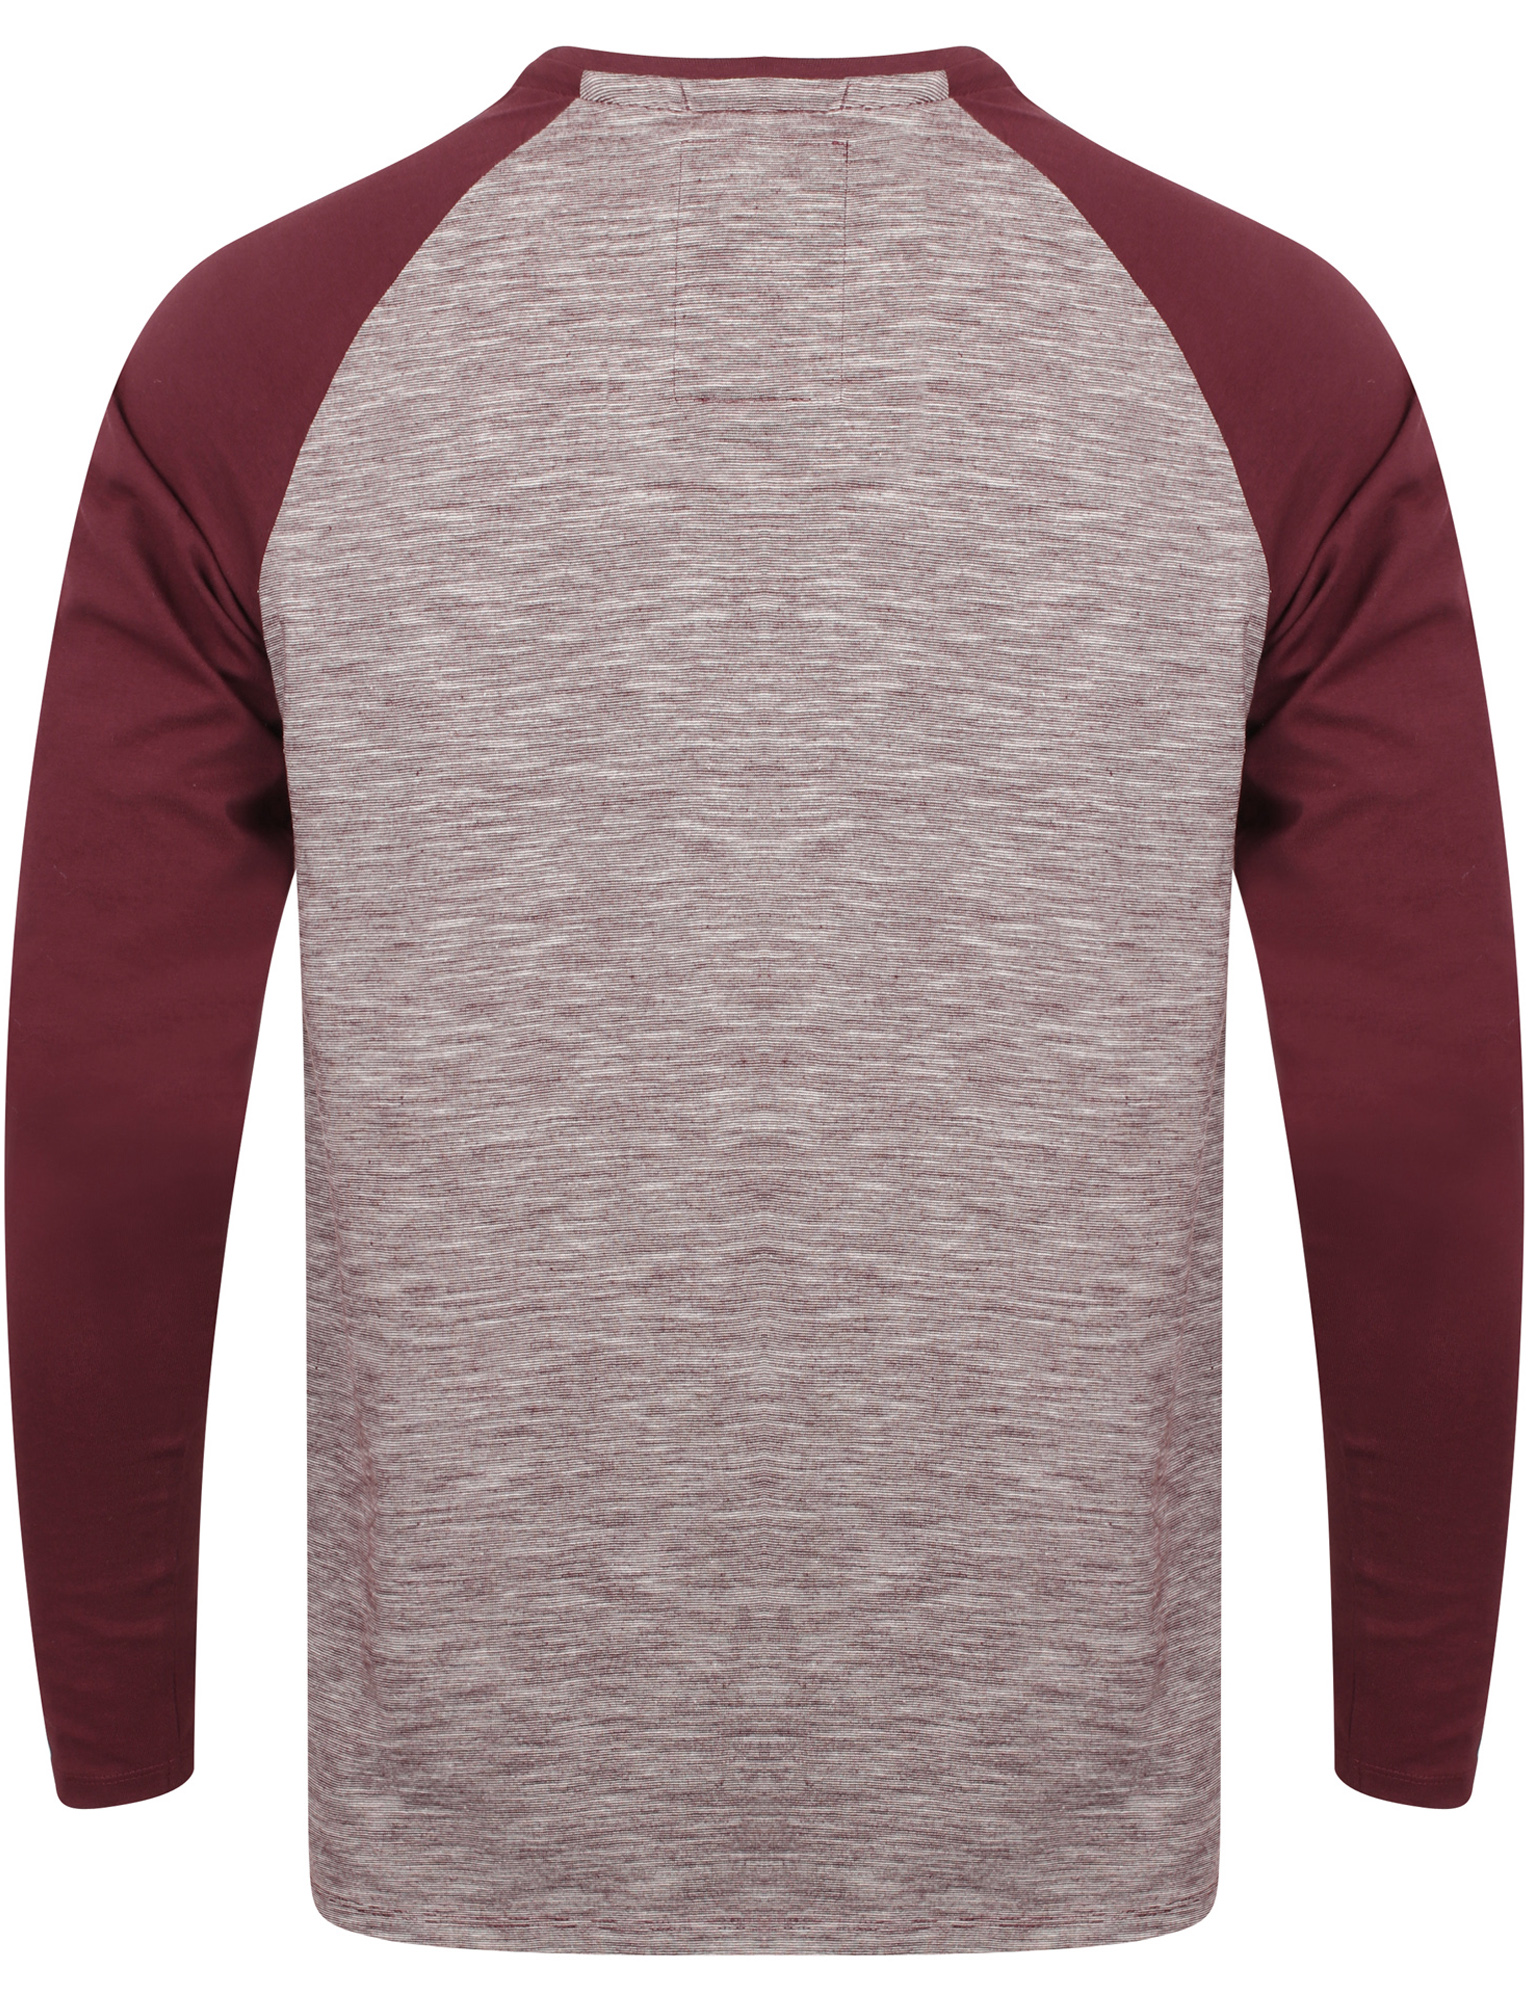 New-Tokyo-Laundry-Mens-Crew-Neck-Cotton-Blend-Long-Contrast-Sleeve-Top-Size-S-XL thumbnail 11